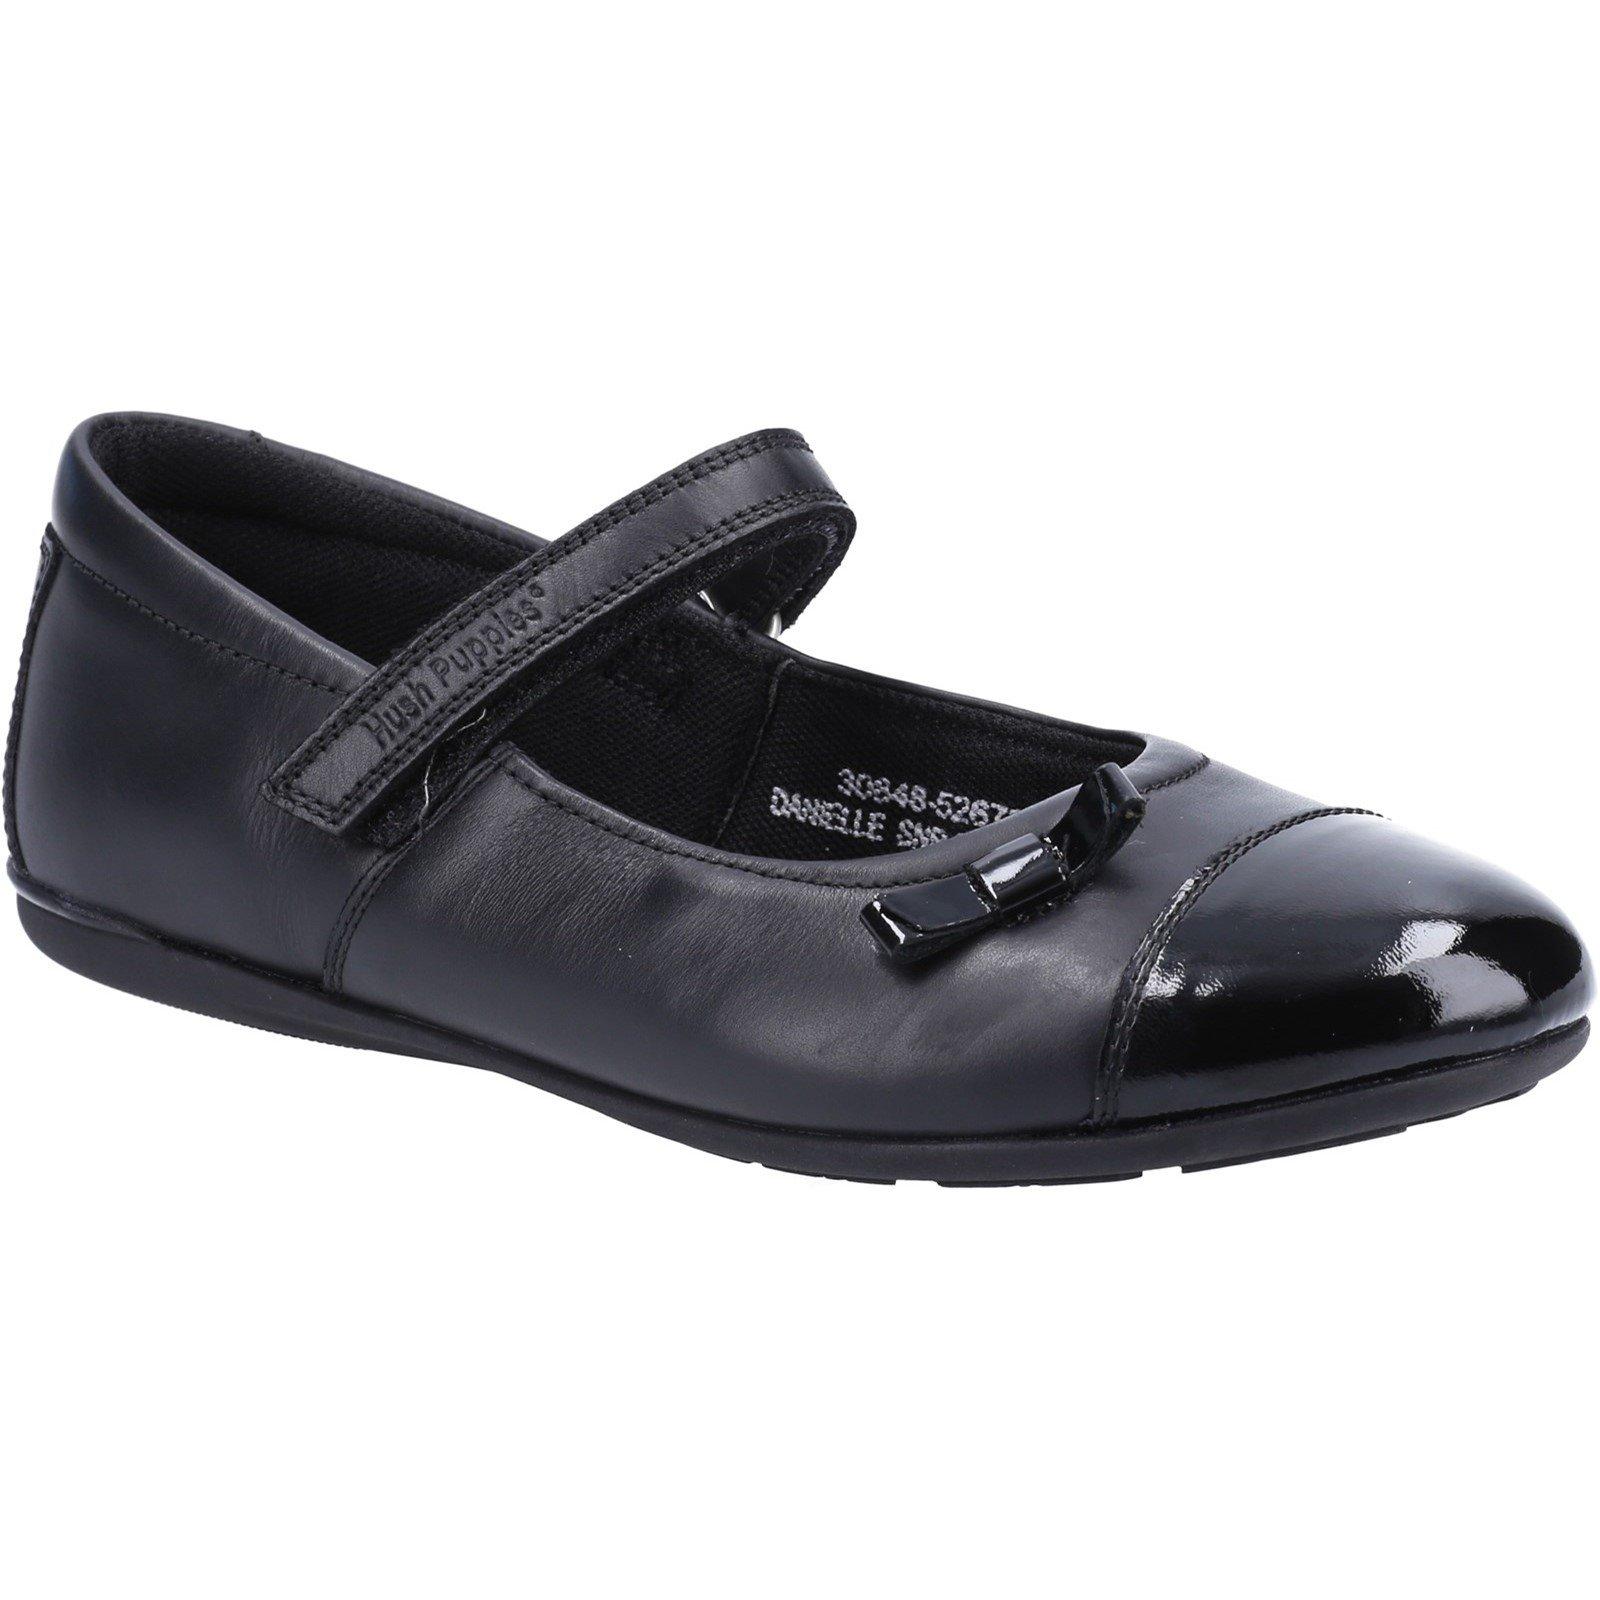 Hush Puppies Kid's Danielle Junior School Shoe Black 30847 - Black 1